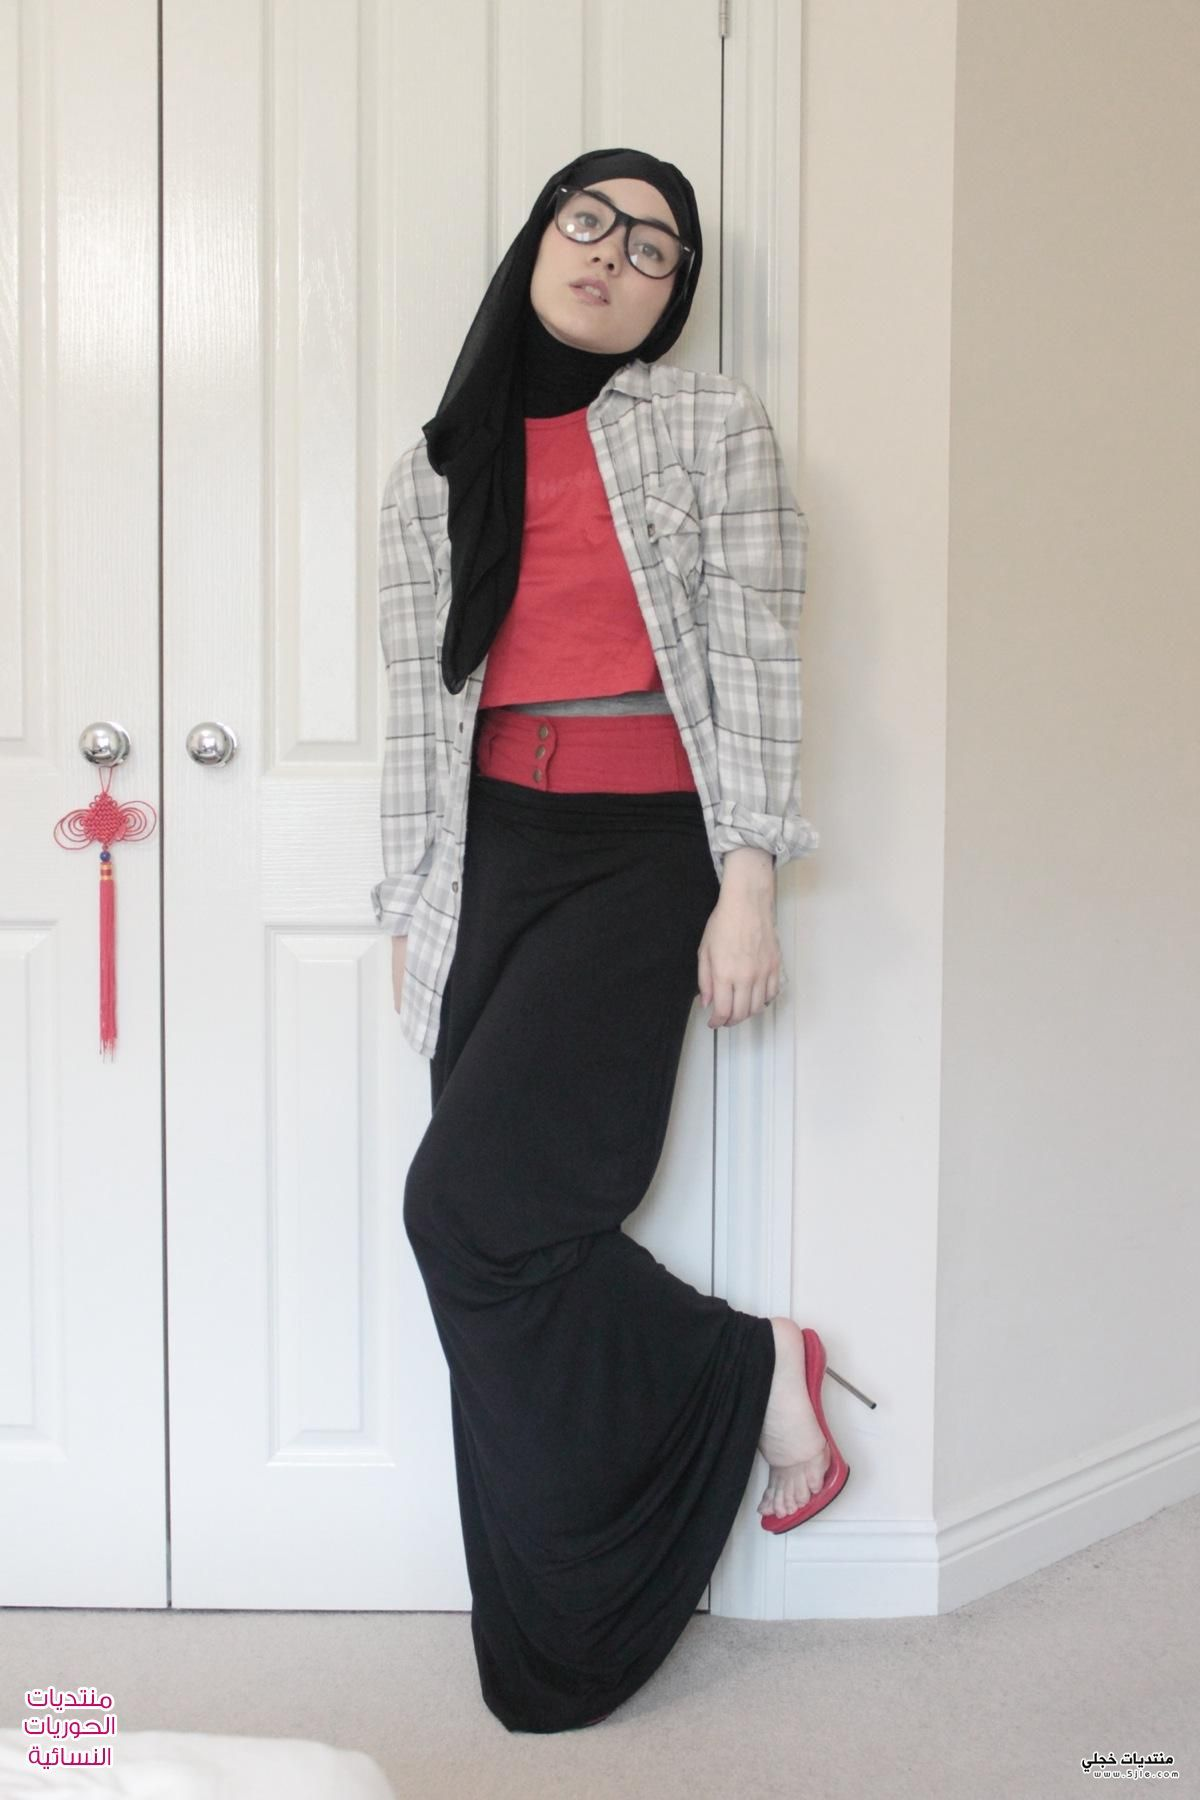 اناقة الحجاب بالصور 2014 موضه